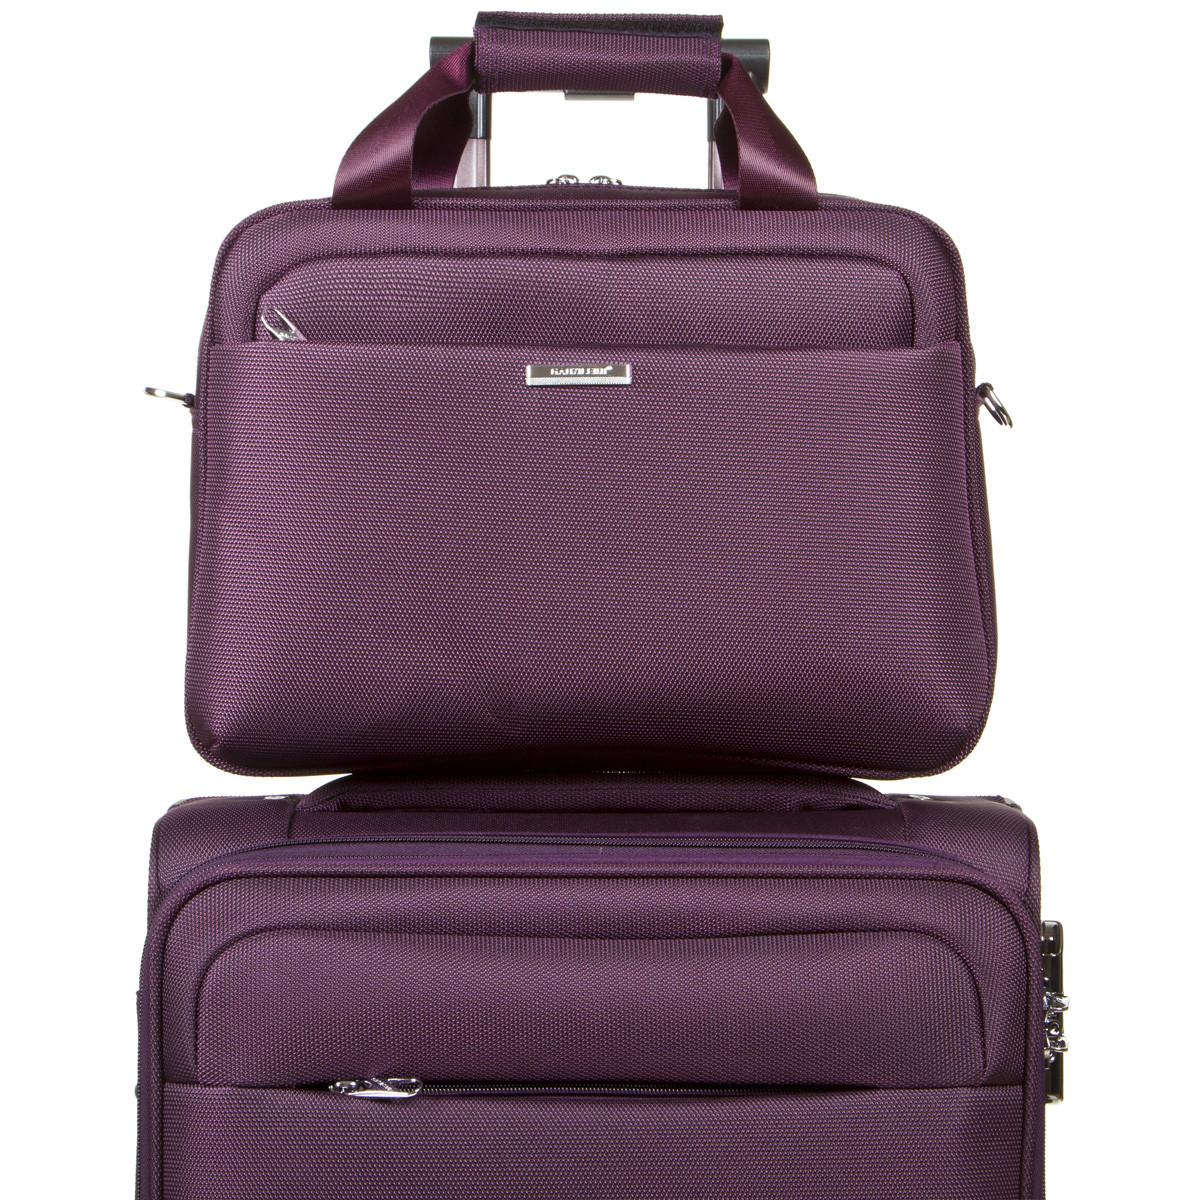 Універсальна дорожня сумка-бьютик BagHouse з кріпленням на ручку валізи 38х29х15 фіолетова ксГЦ868ф